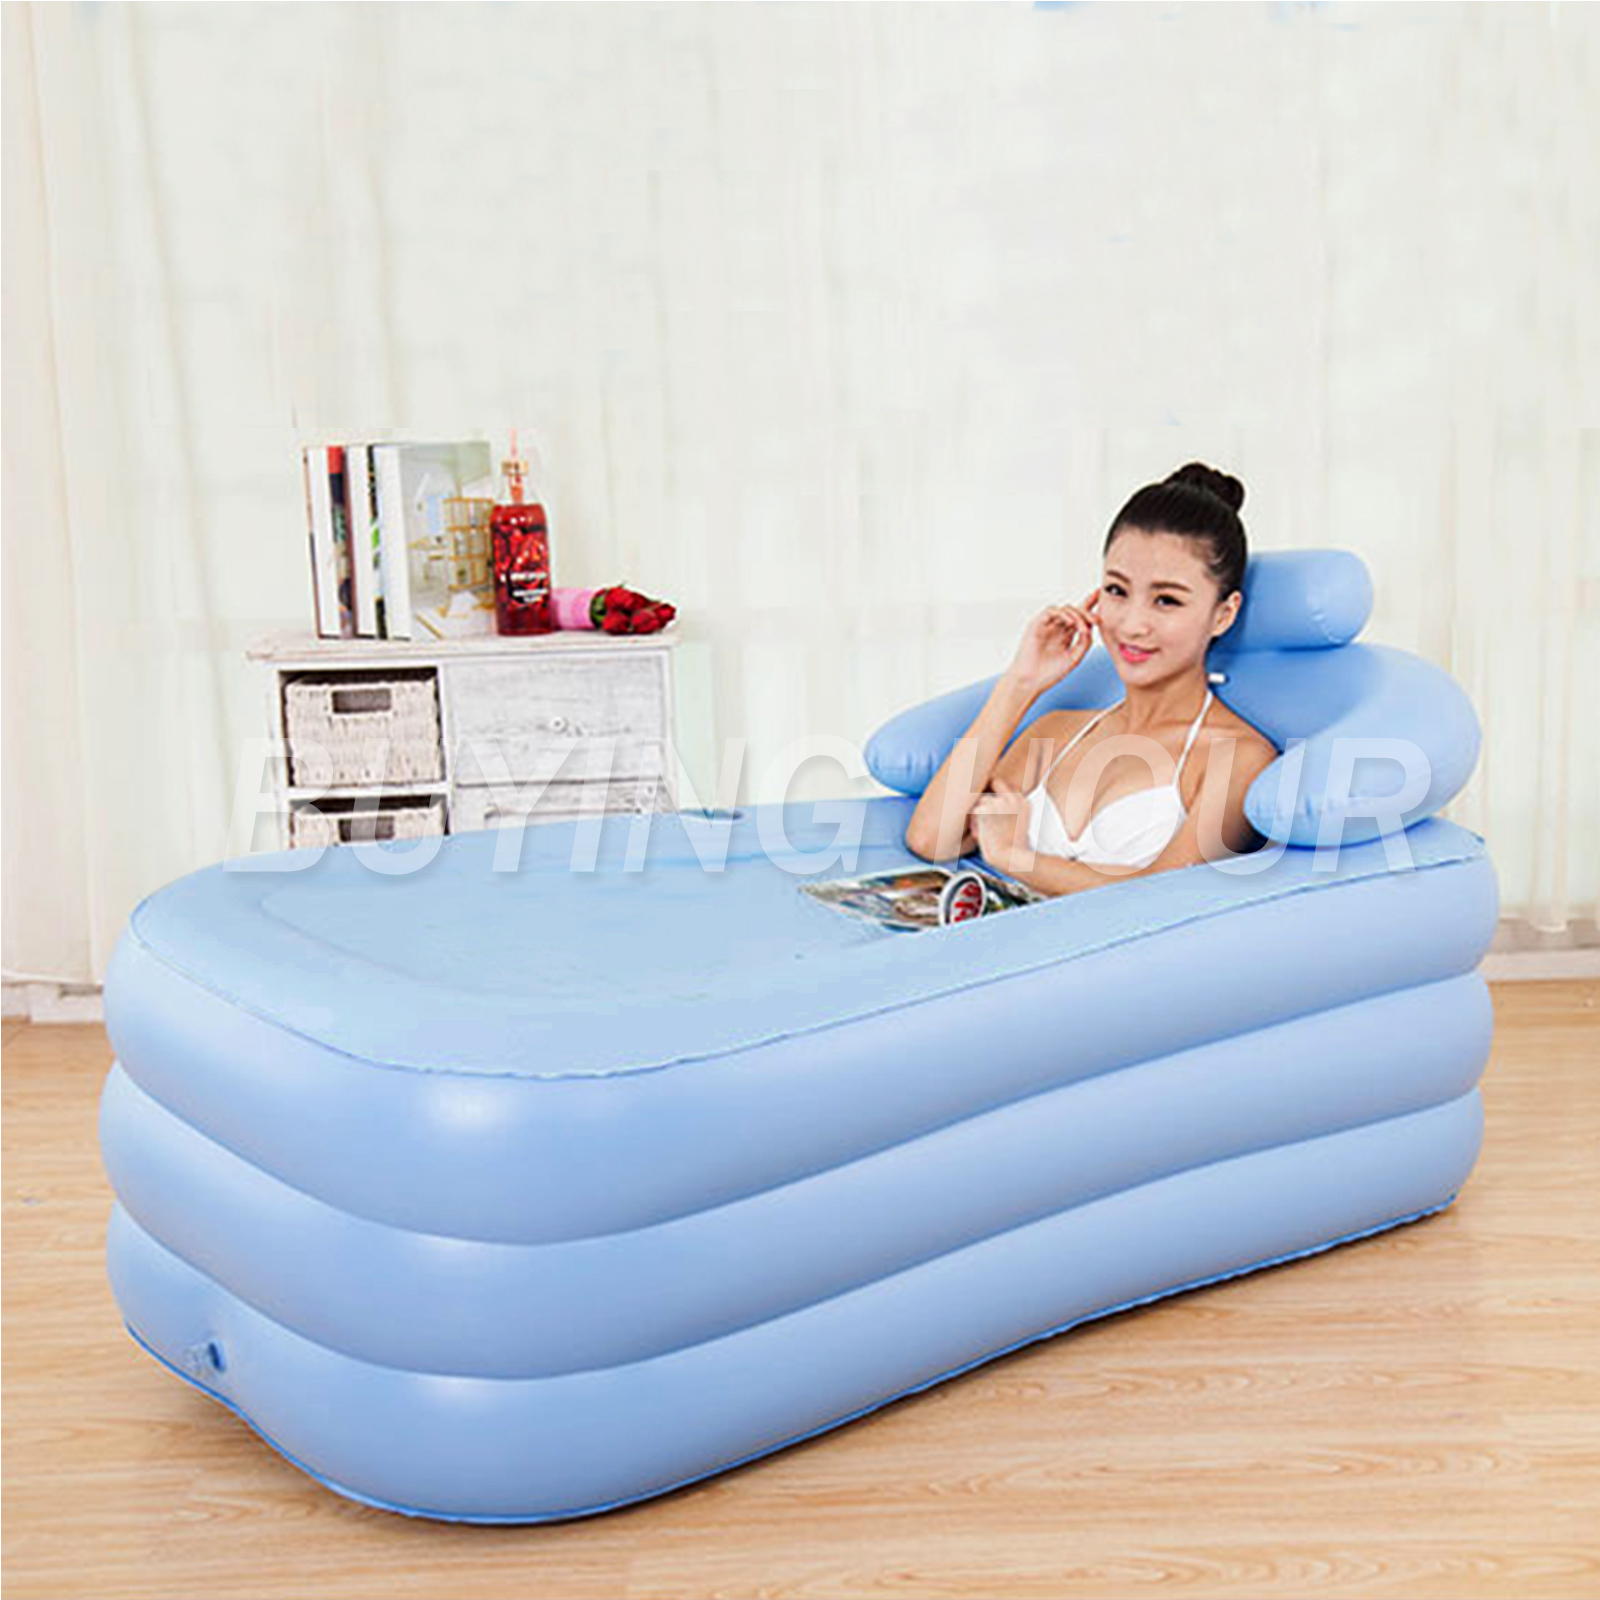 Inflatable Portable Adult PVC Folding Bath Tub Air Fast